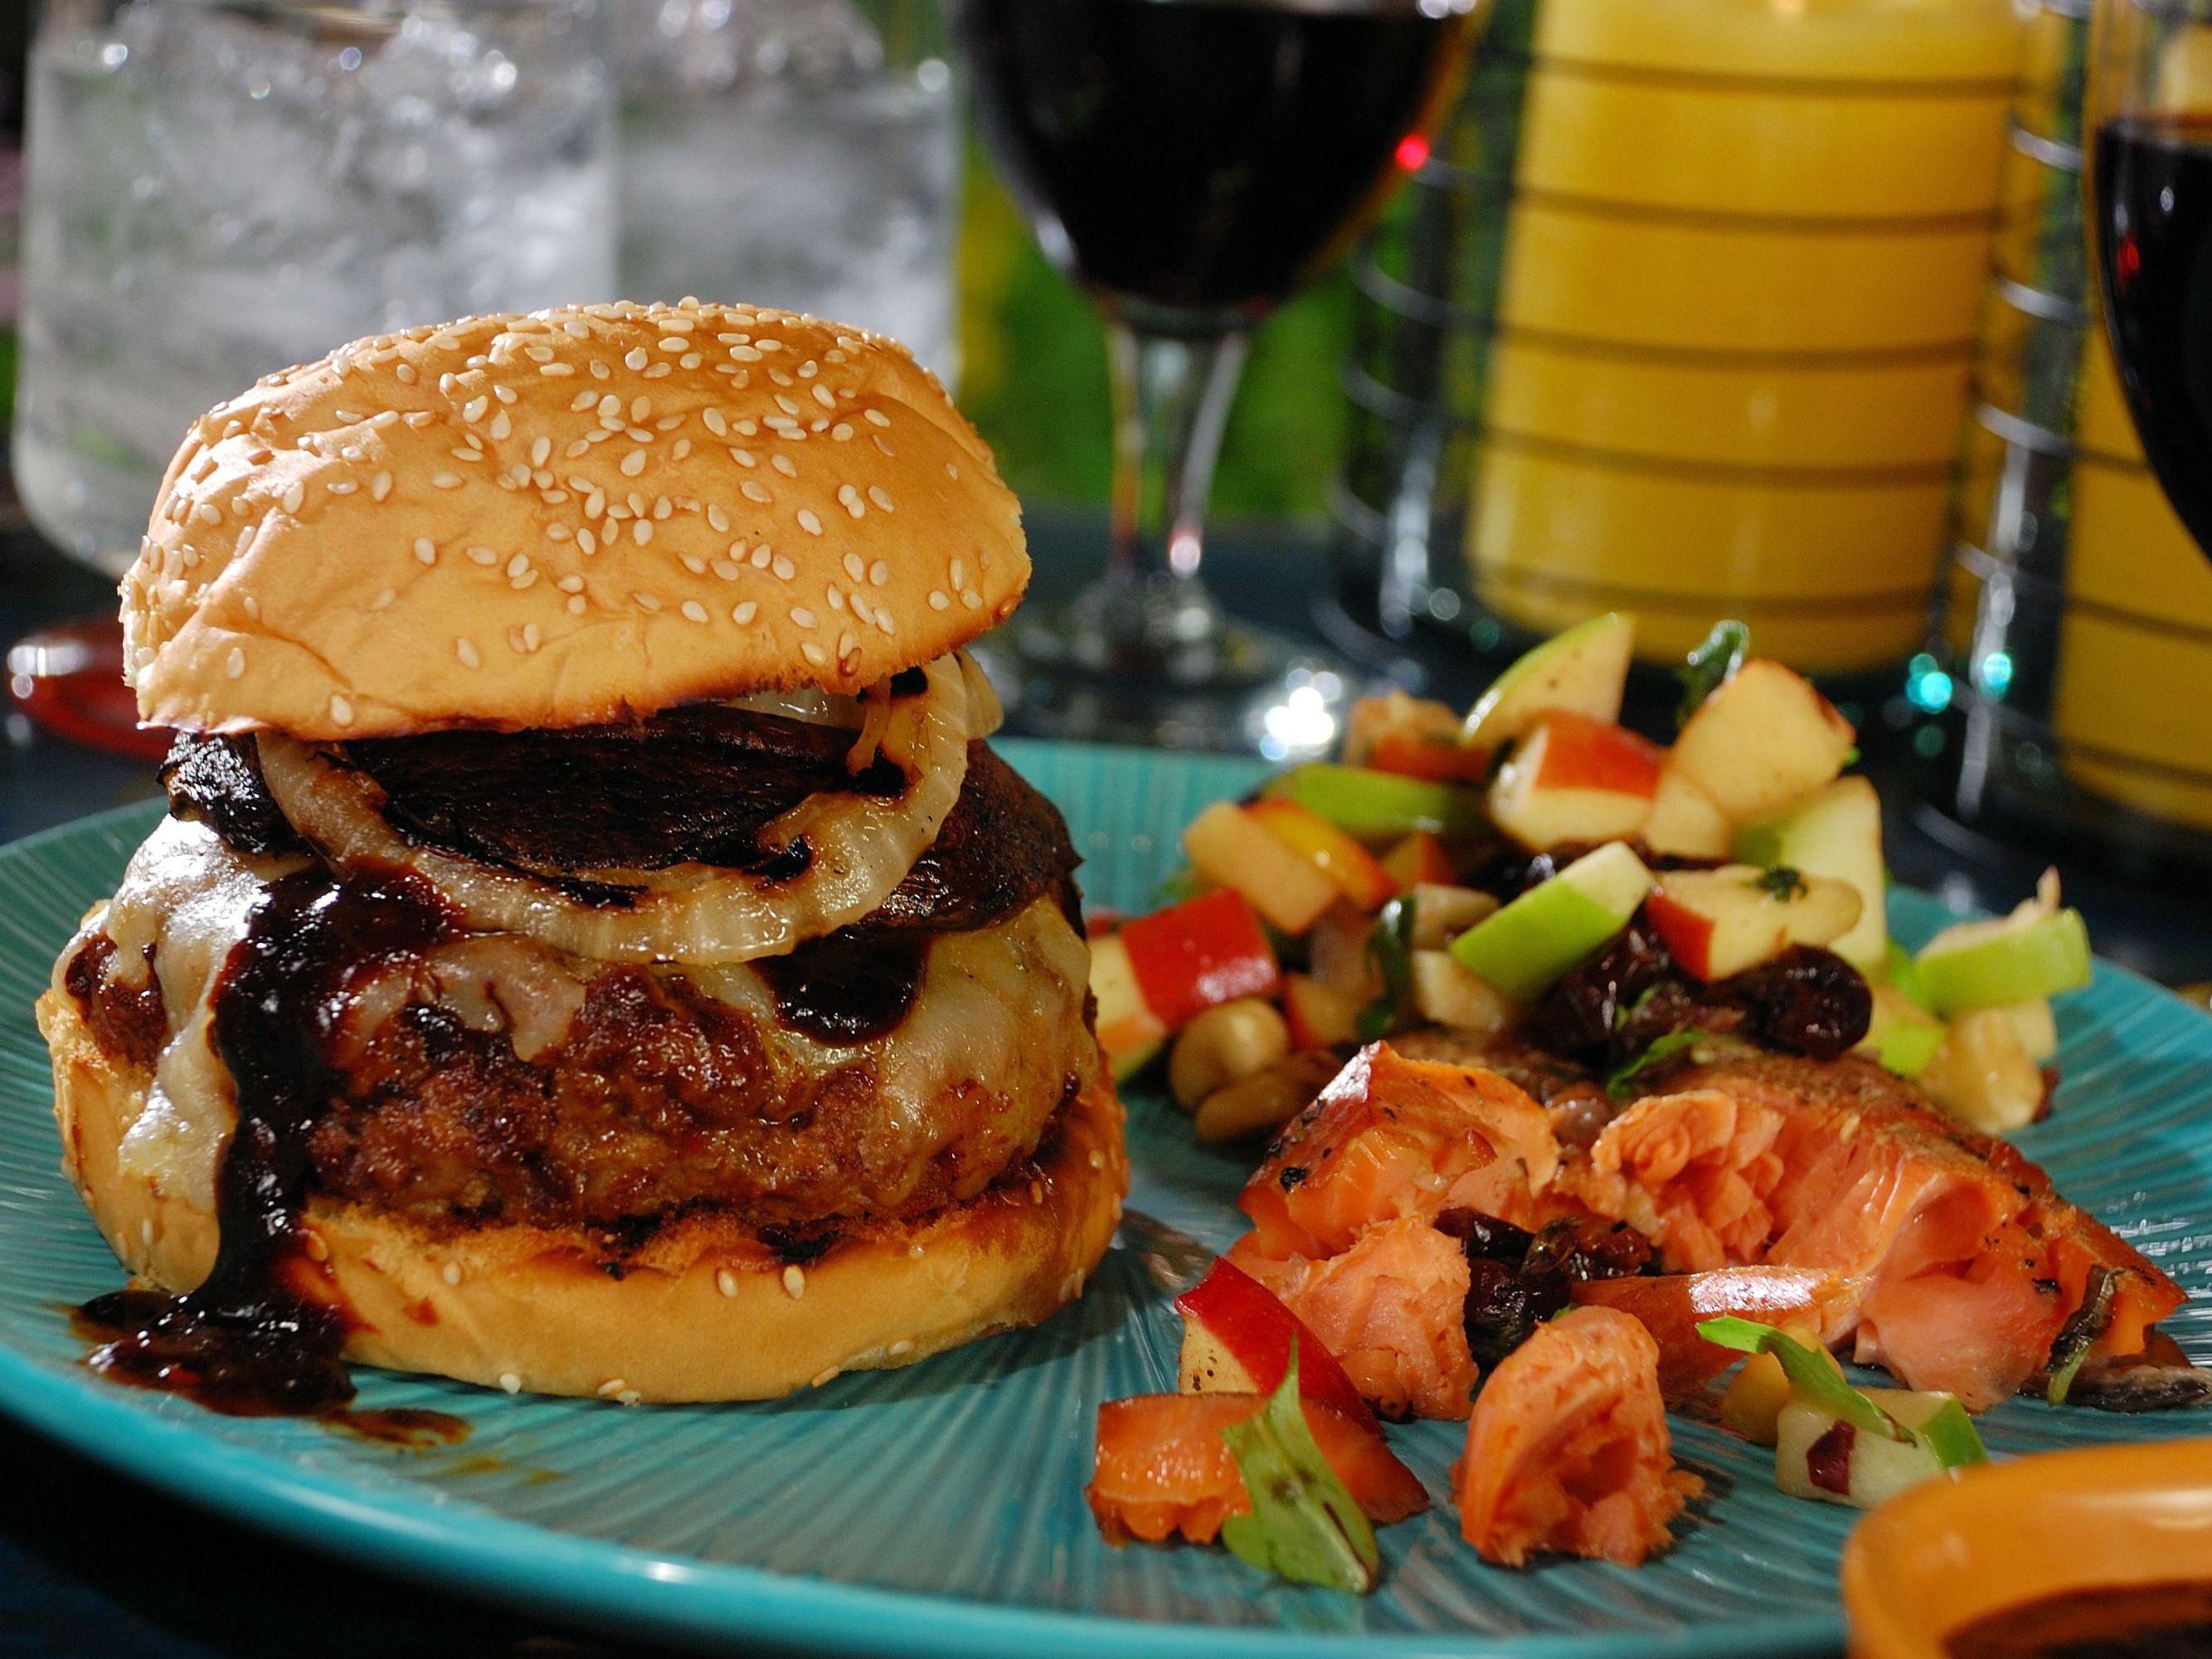 Cedar planked burgers recipe food recipes food